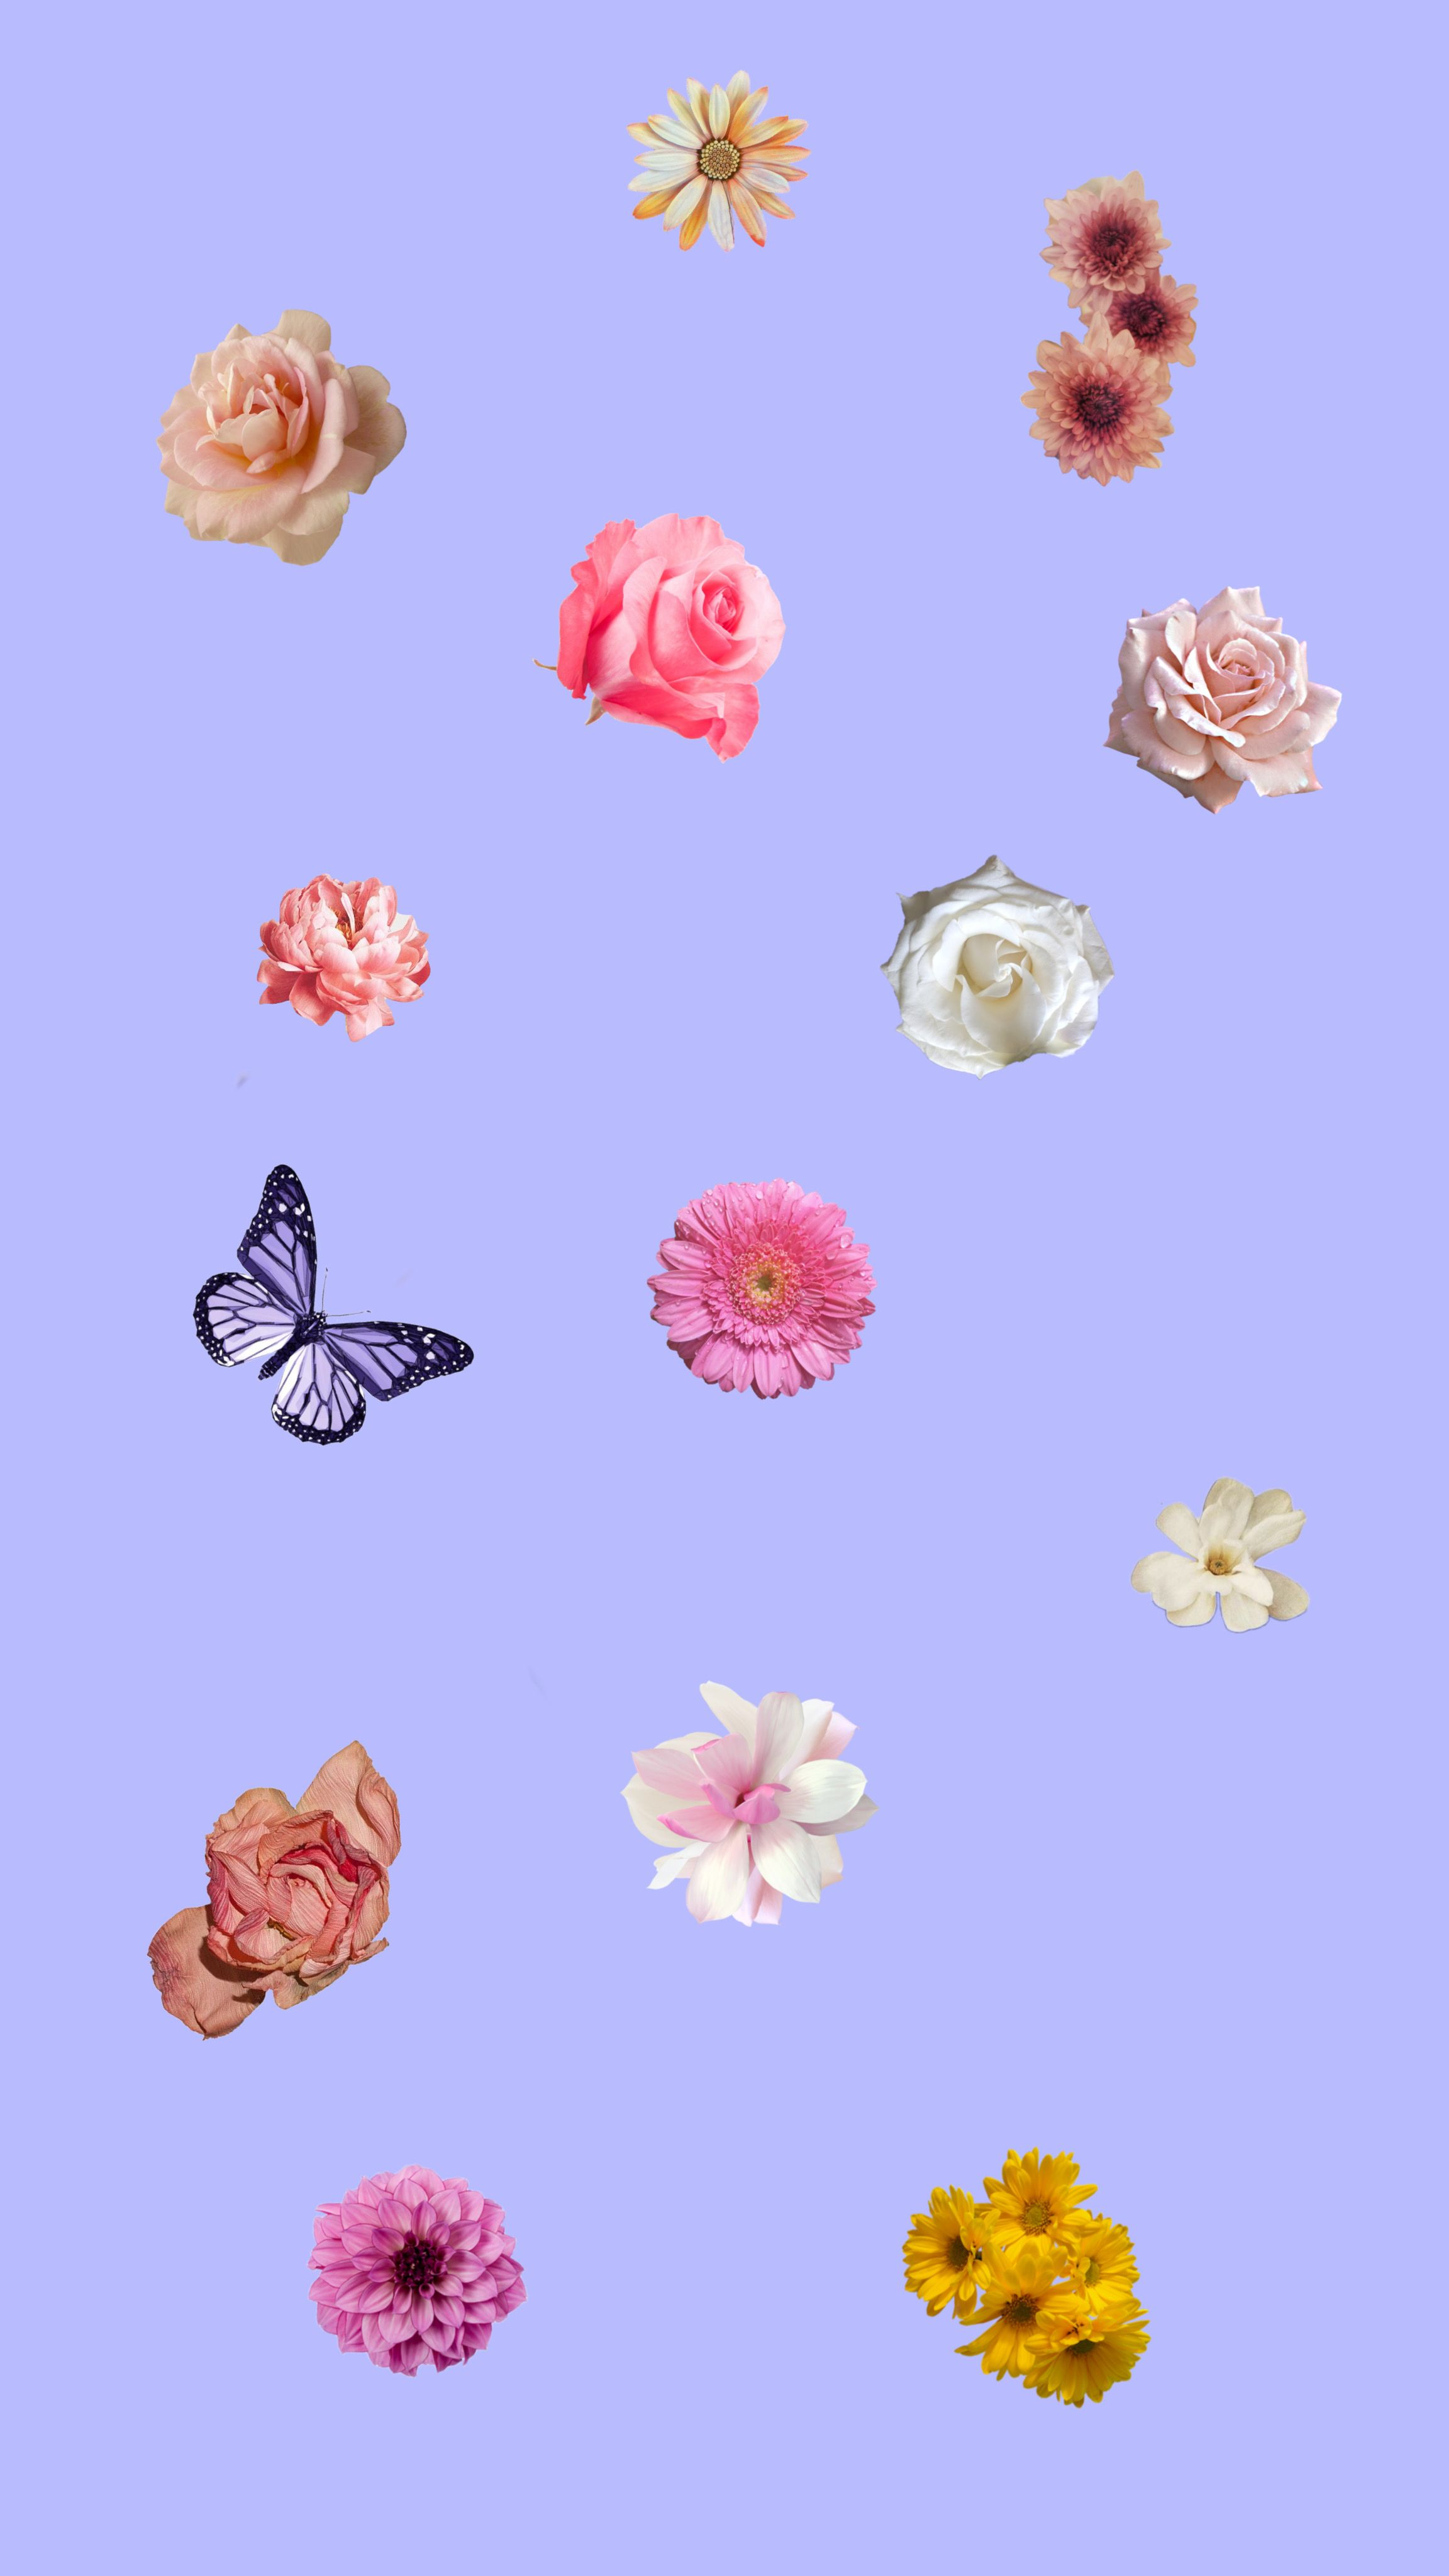 Pin by DEVIN KORESH on wallpapers in 2020 Cute emoji